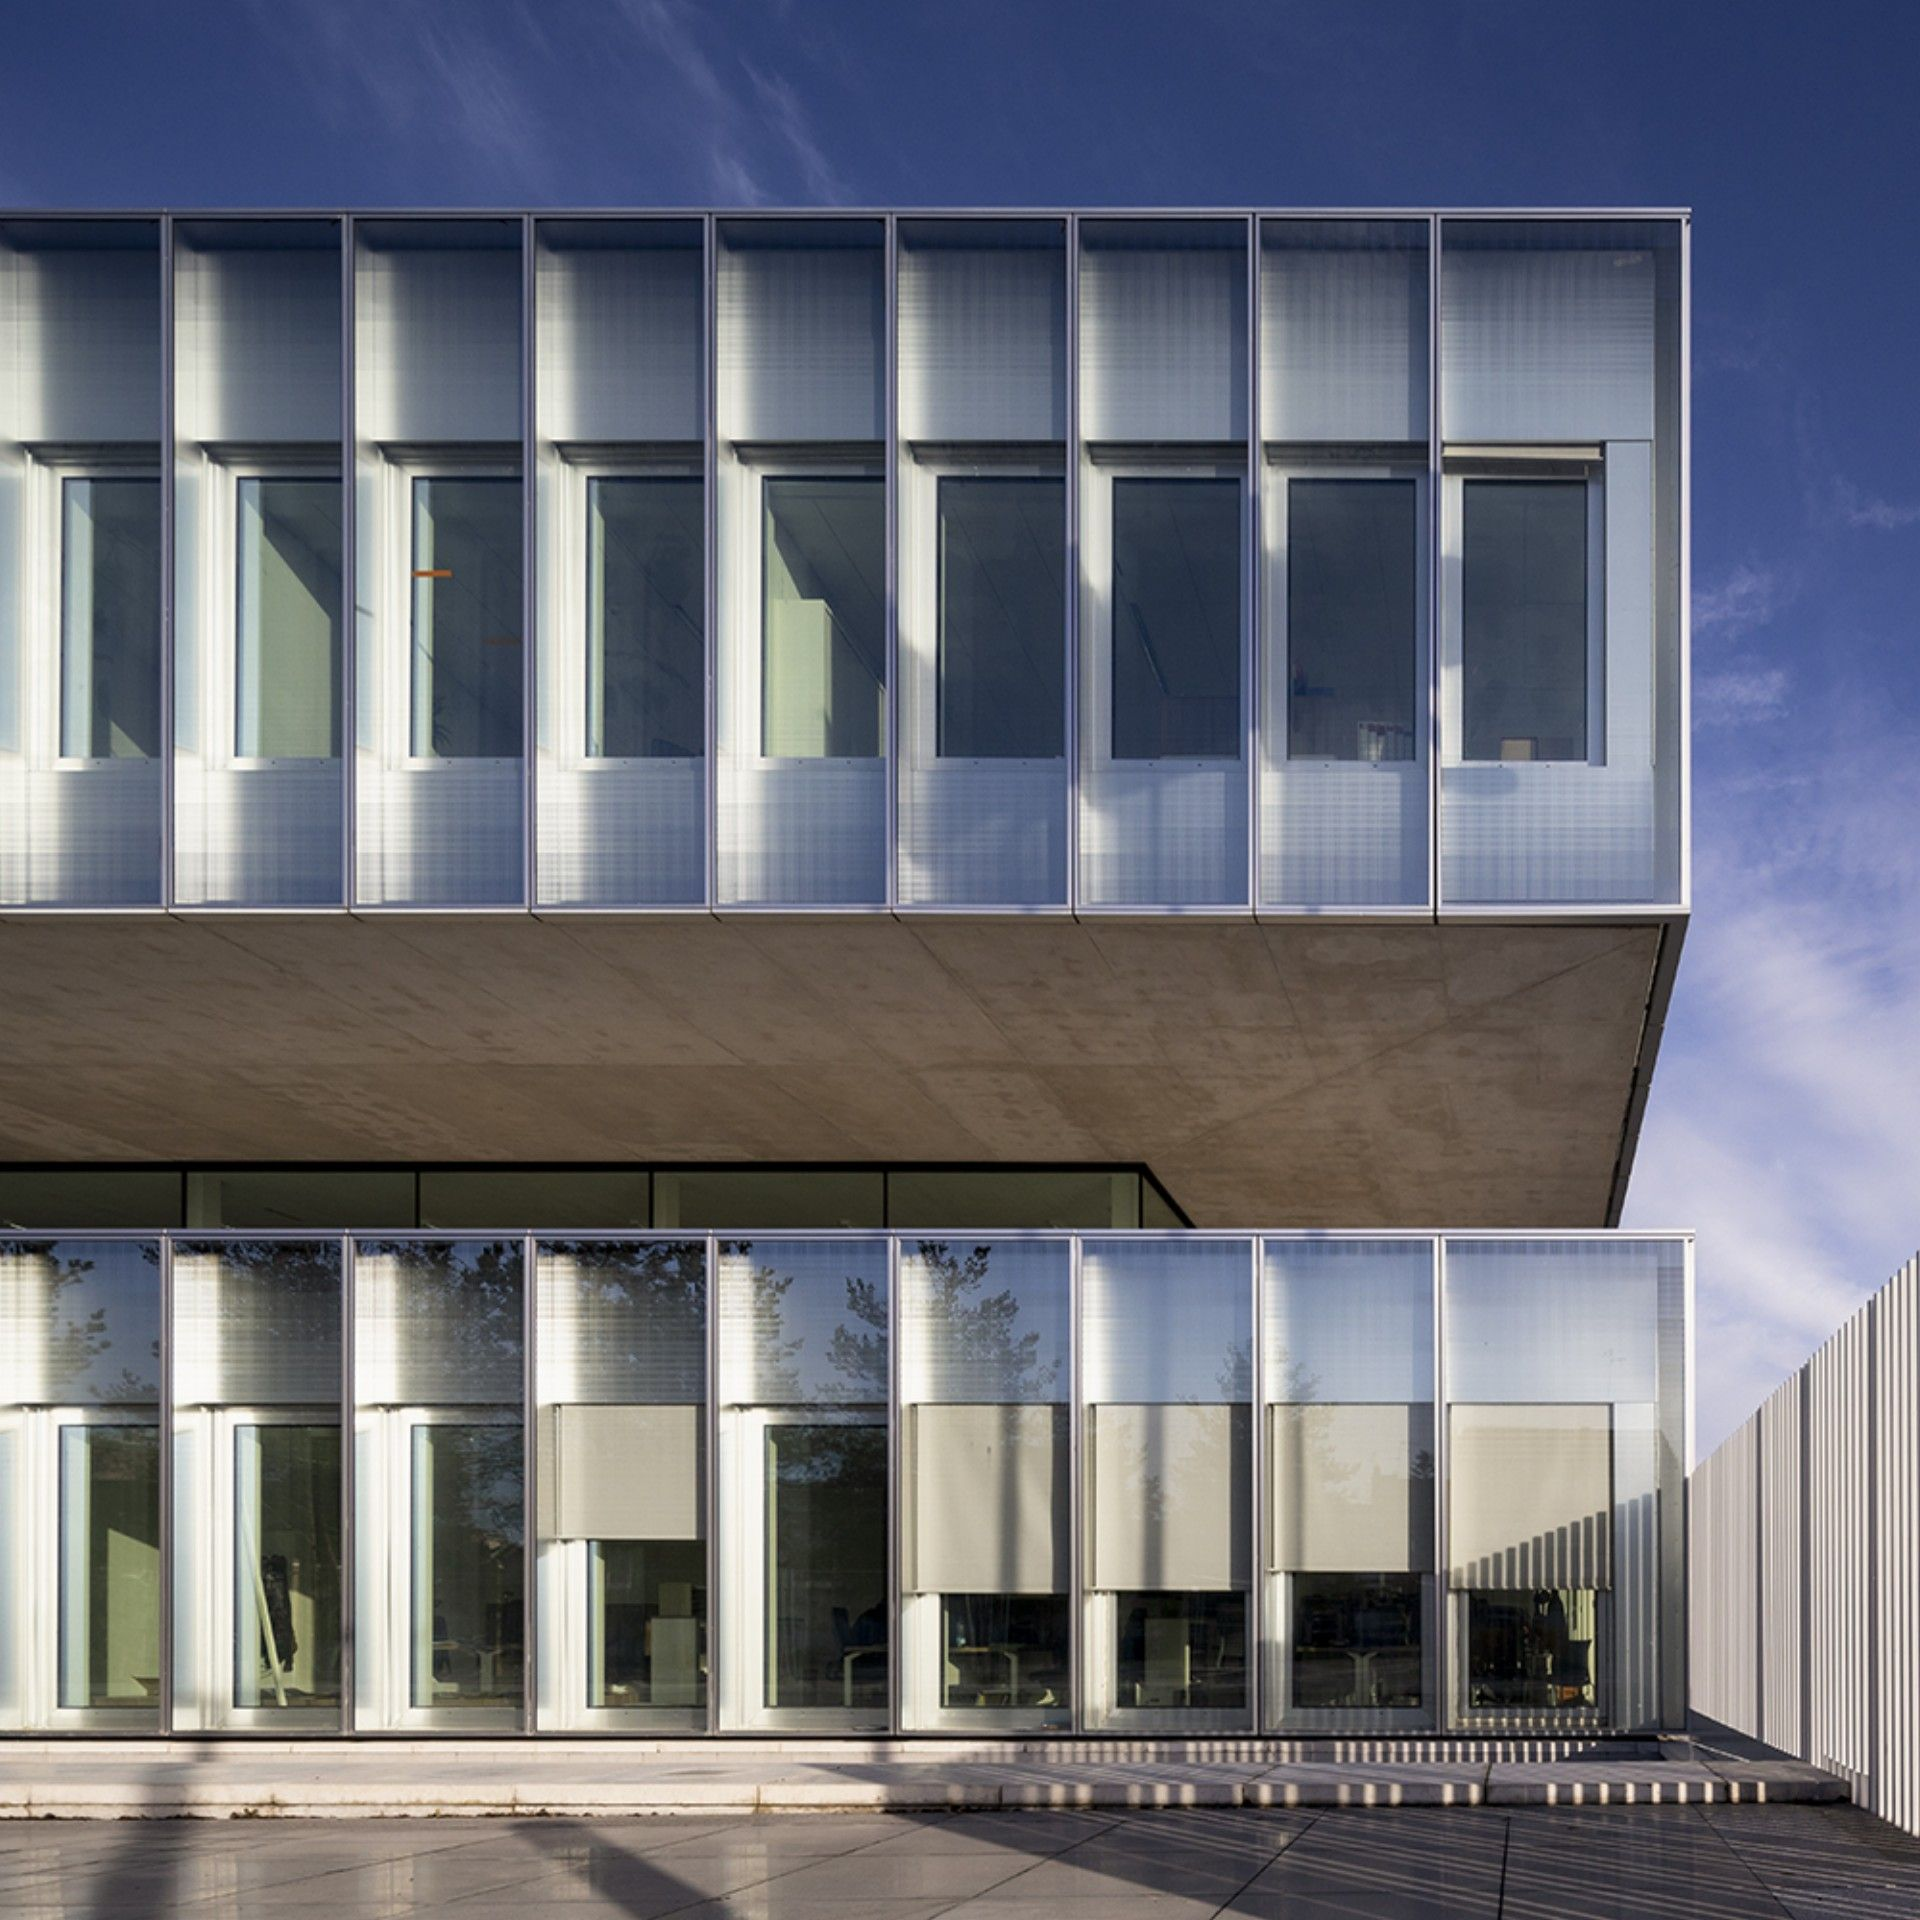 The Kaan And Pranlasdescours Firms Design The New Chambre De Metiers Et De L Artisanat In Lille Floornature Architecture Glass Facades Lille